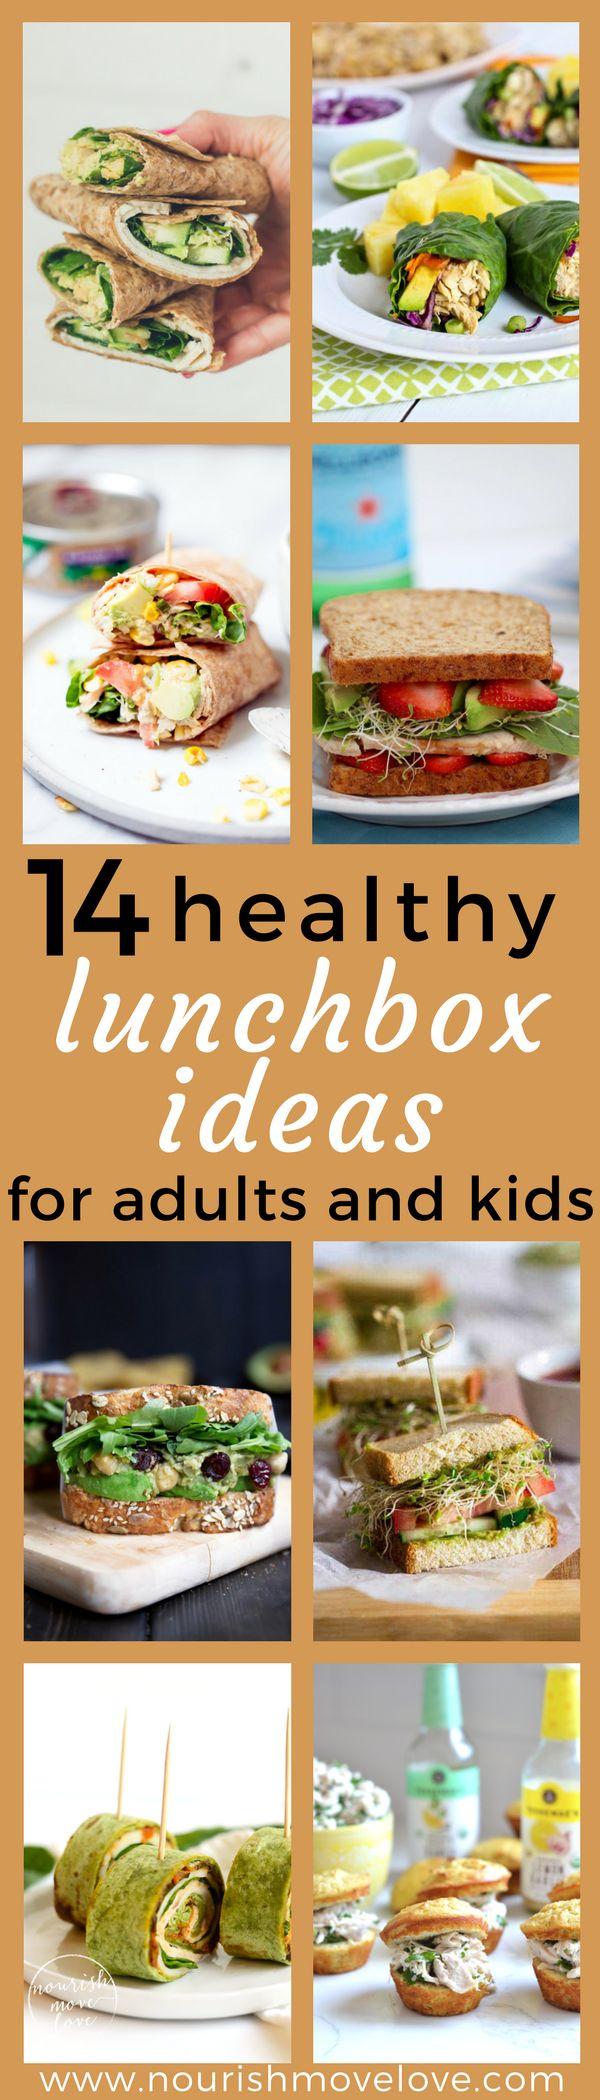 14 Healthy Lunch Box Ideas for Adults   Kids | www.nourishmovelove.com